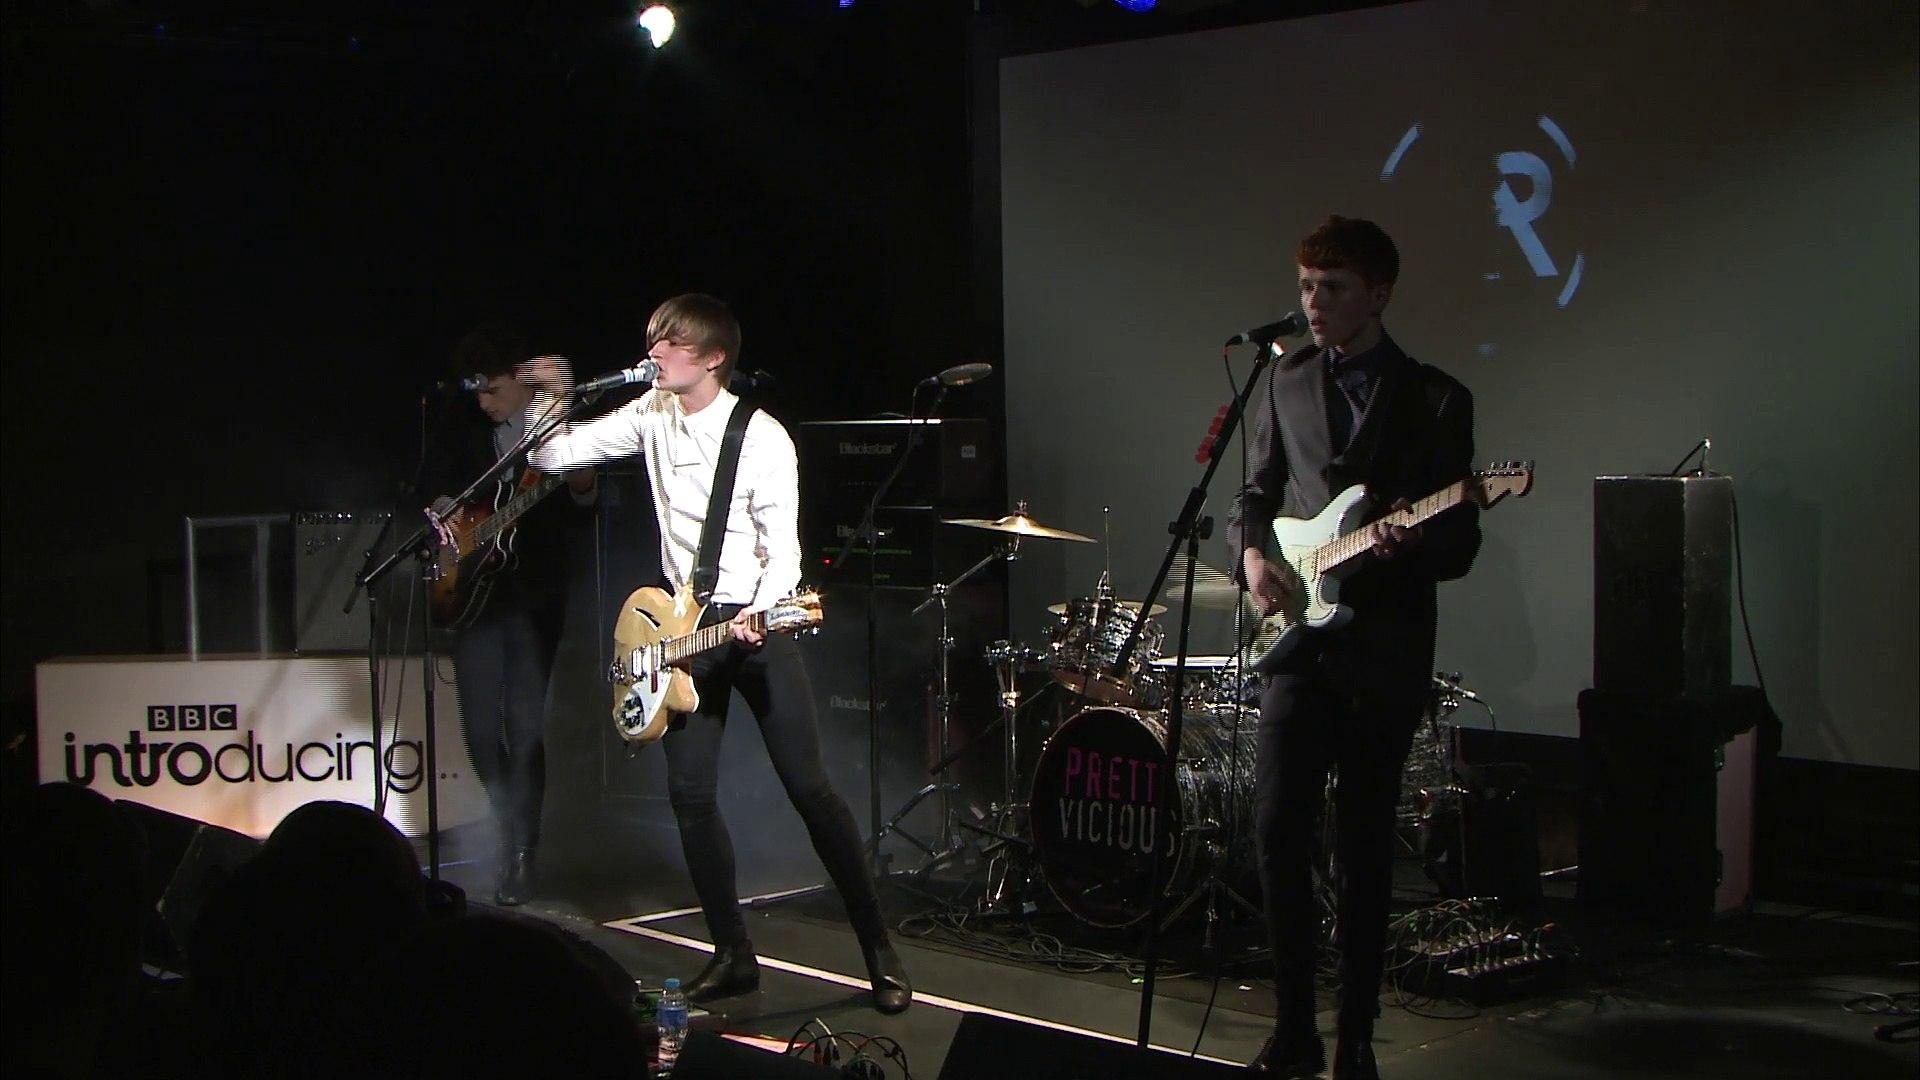 Rising & BBC Introducing - The Tones - Dodd